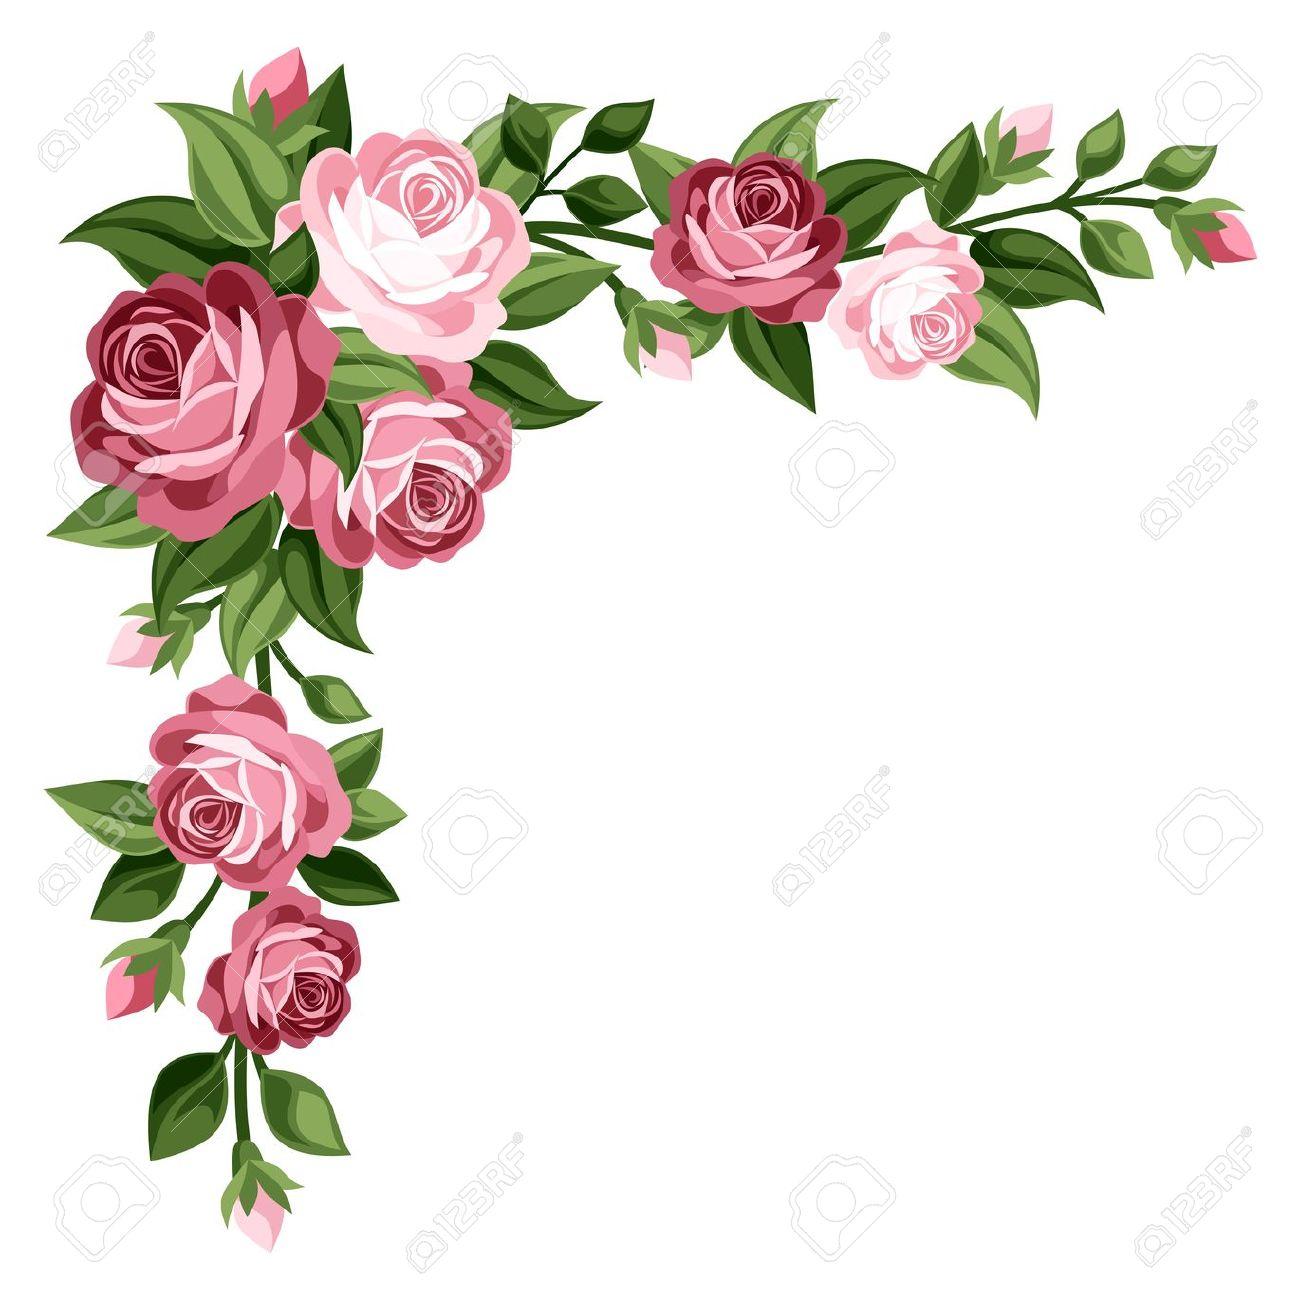 1300x1300 Pink Flower Clipart Borders Flower Rose